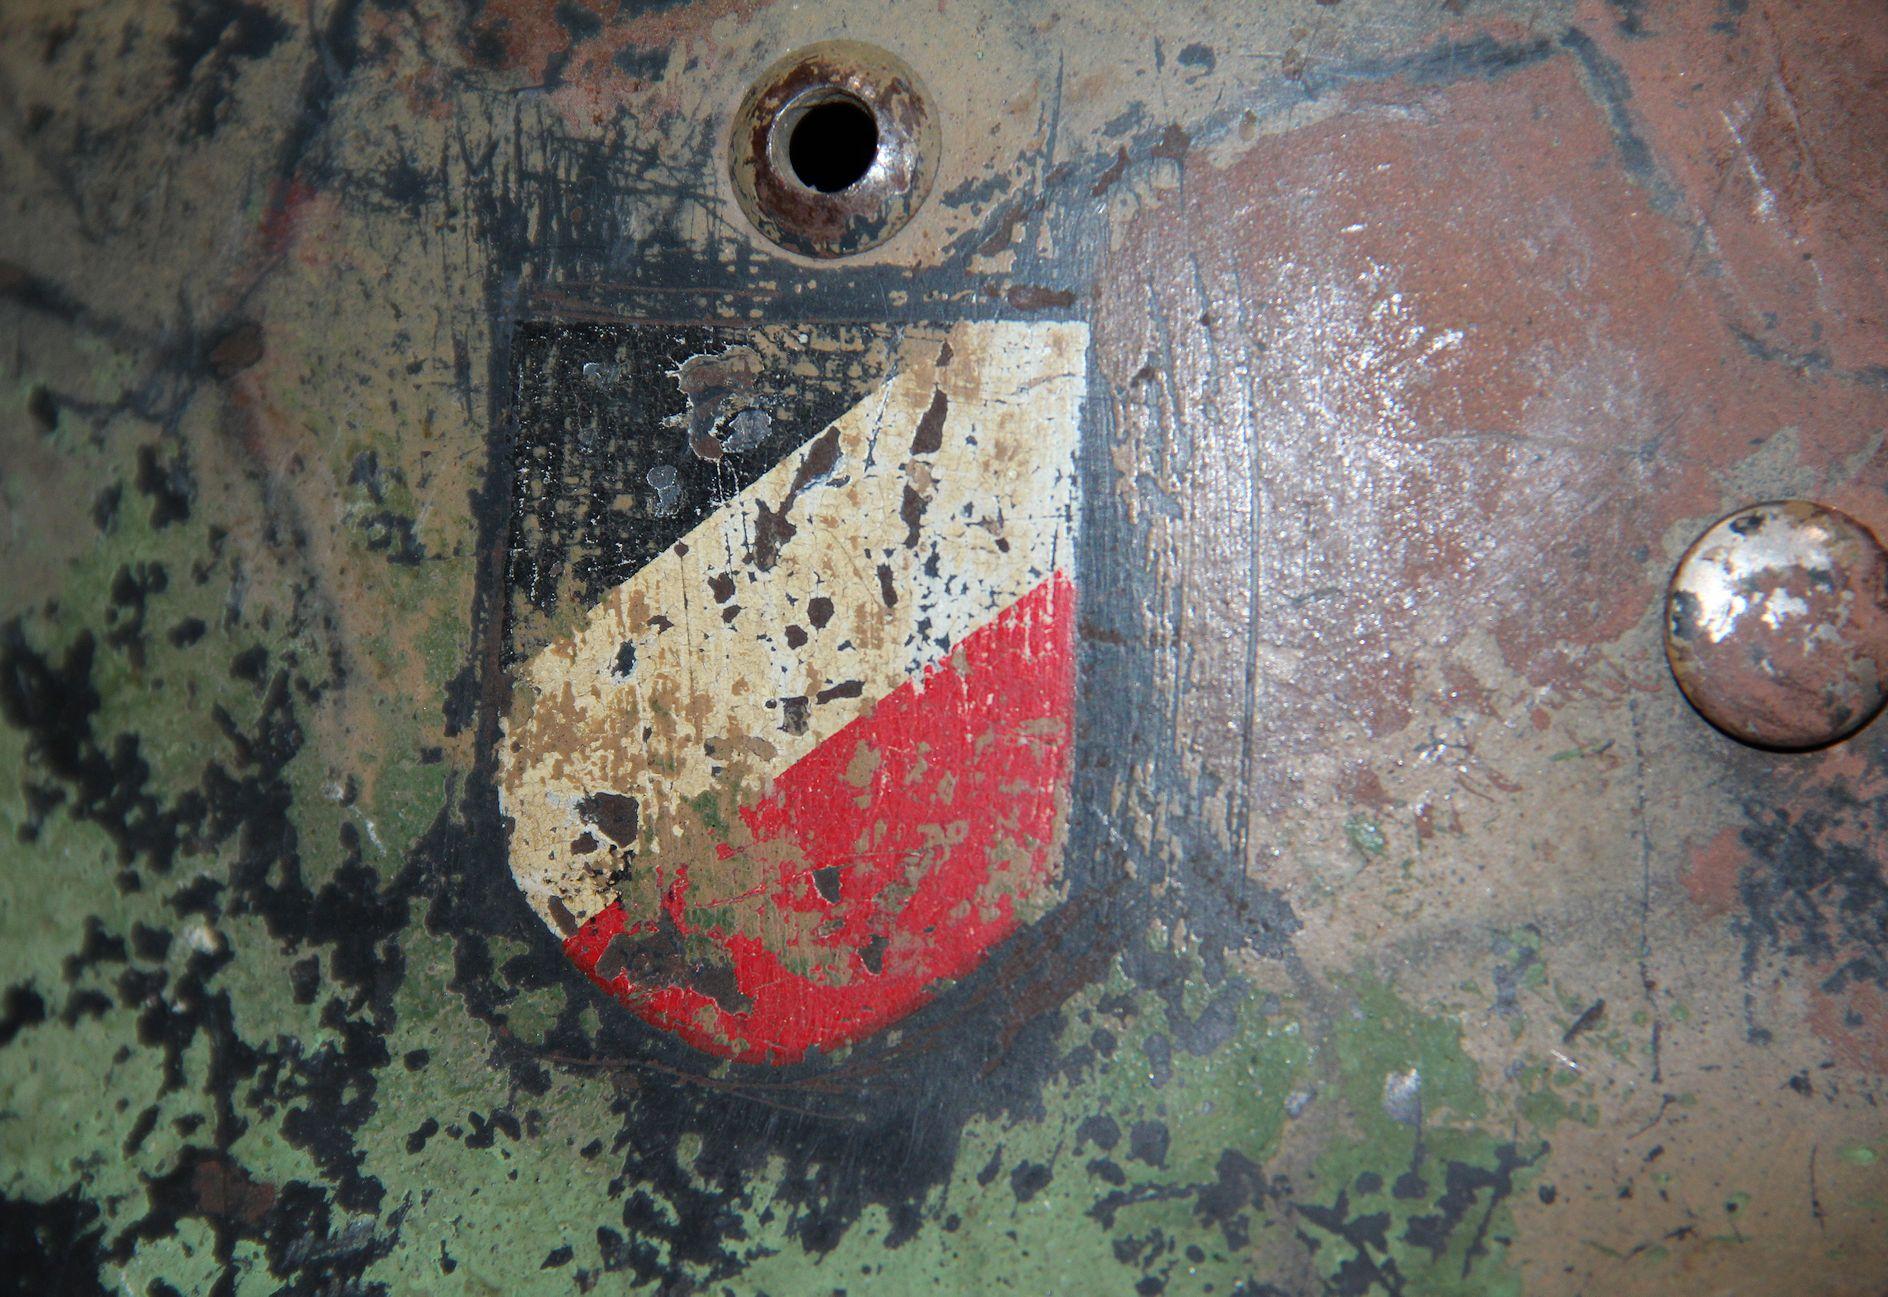 L006. WWII GERMAN LUFTWAFFE DOUBLE DECAL M35 HELMET, CAMO, FORMER ...